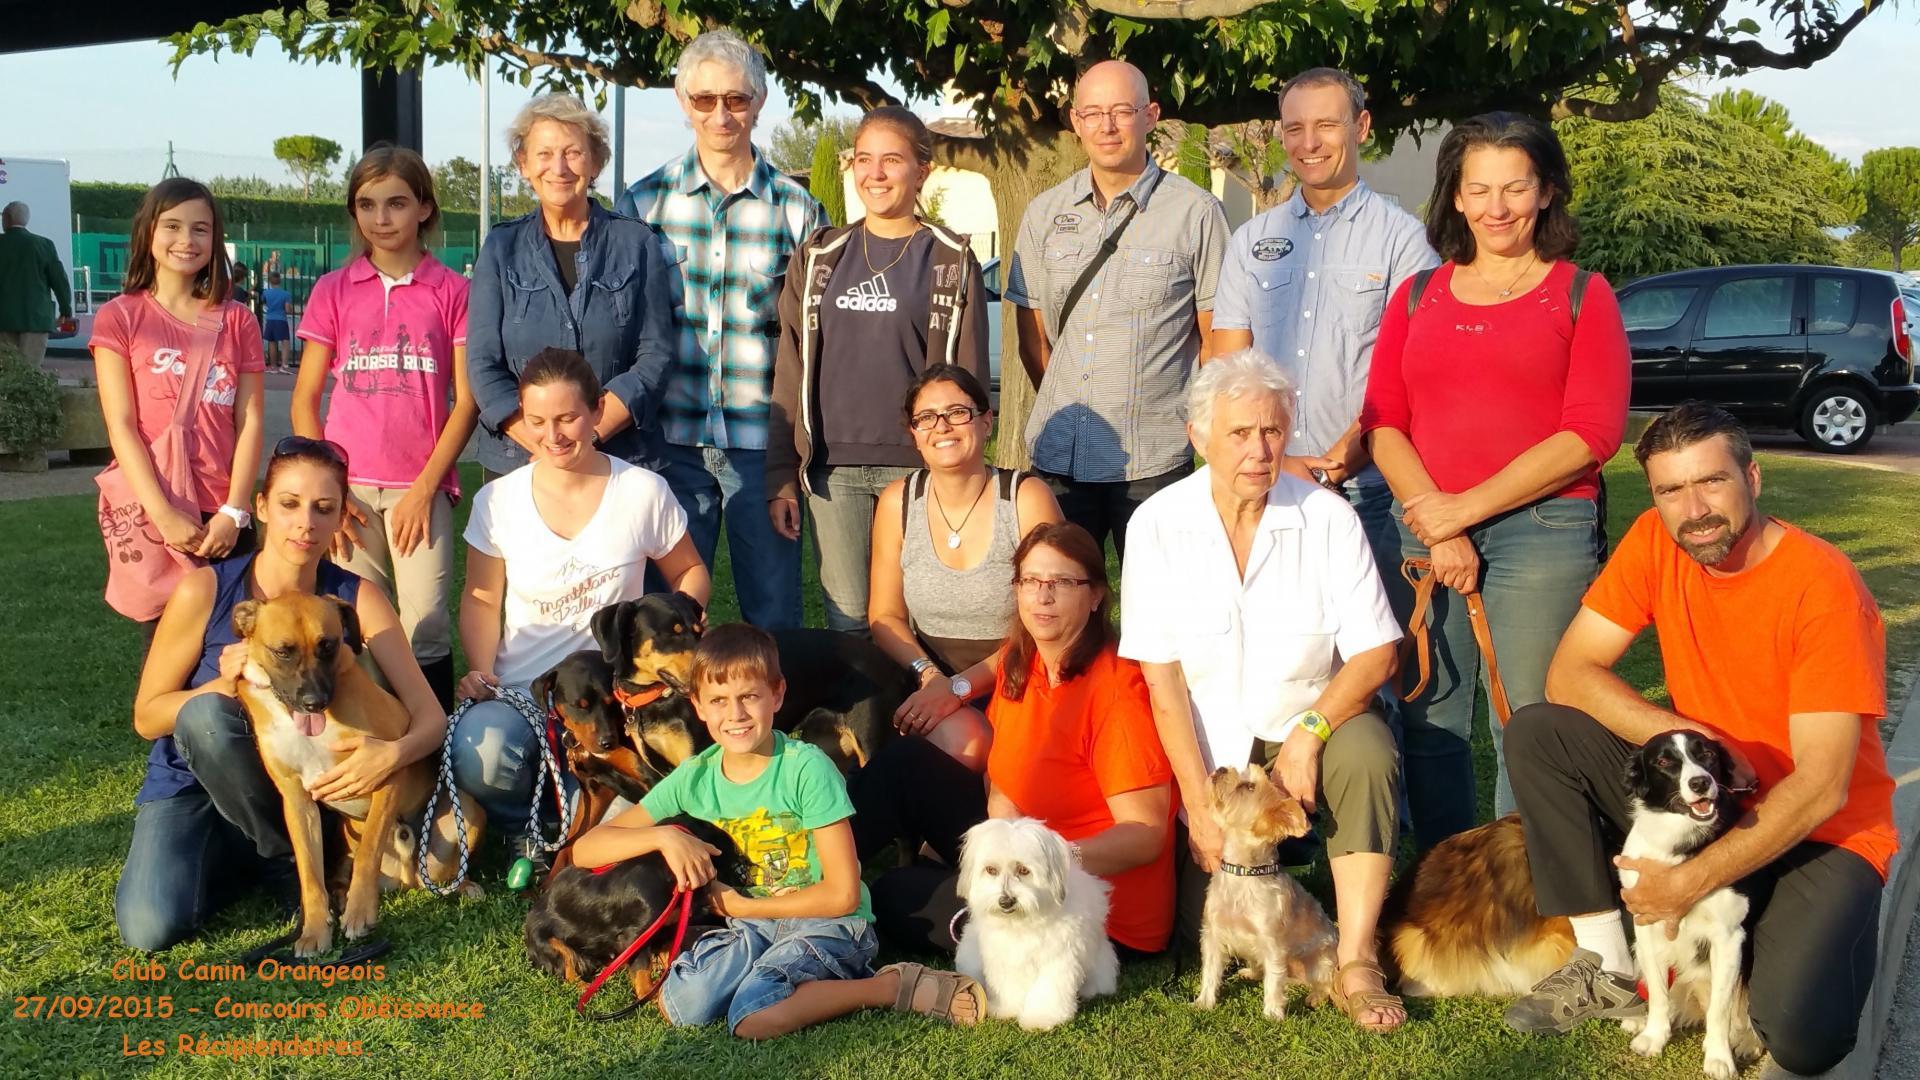 club canin orangeois